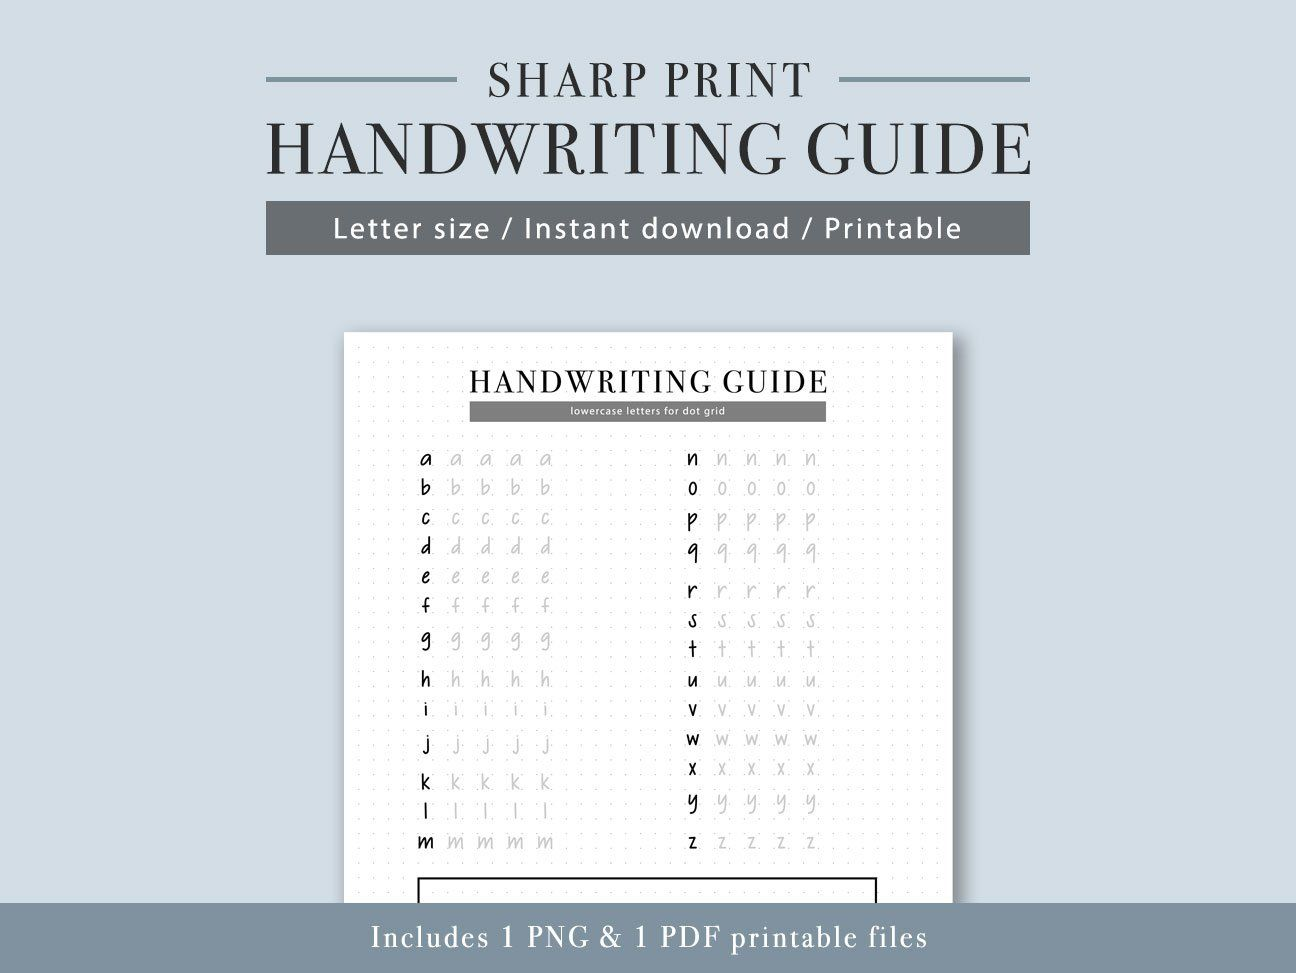 Digital Product Sharp Print Handwriting Practice Guide Print Handwriting Handwriting Practice Learn Handwriting Handwriting practice sheets pdf download